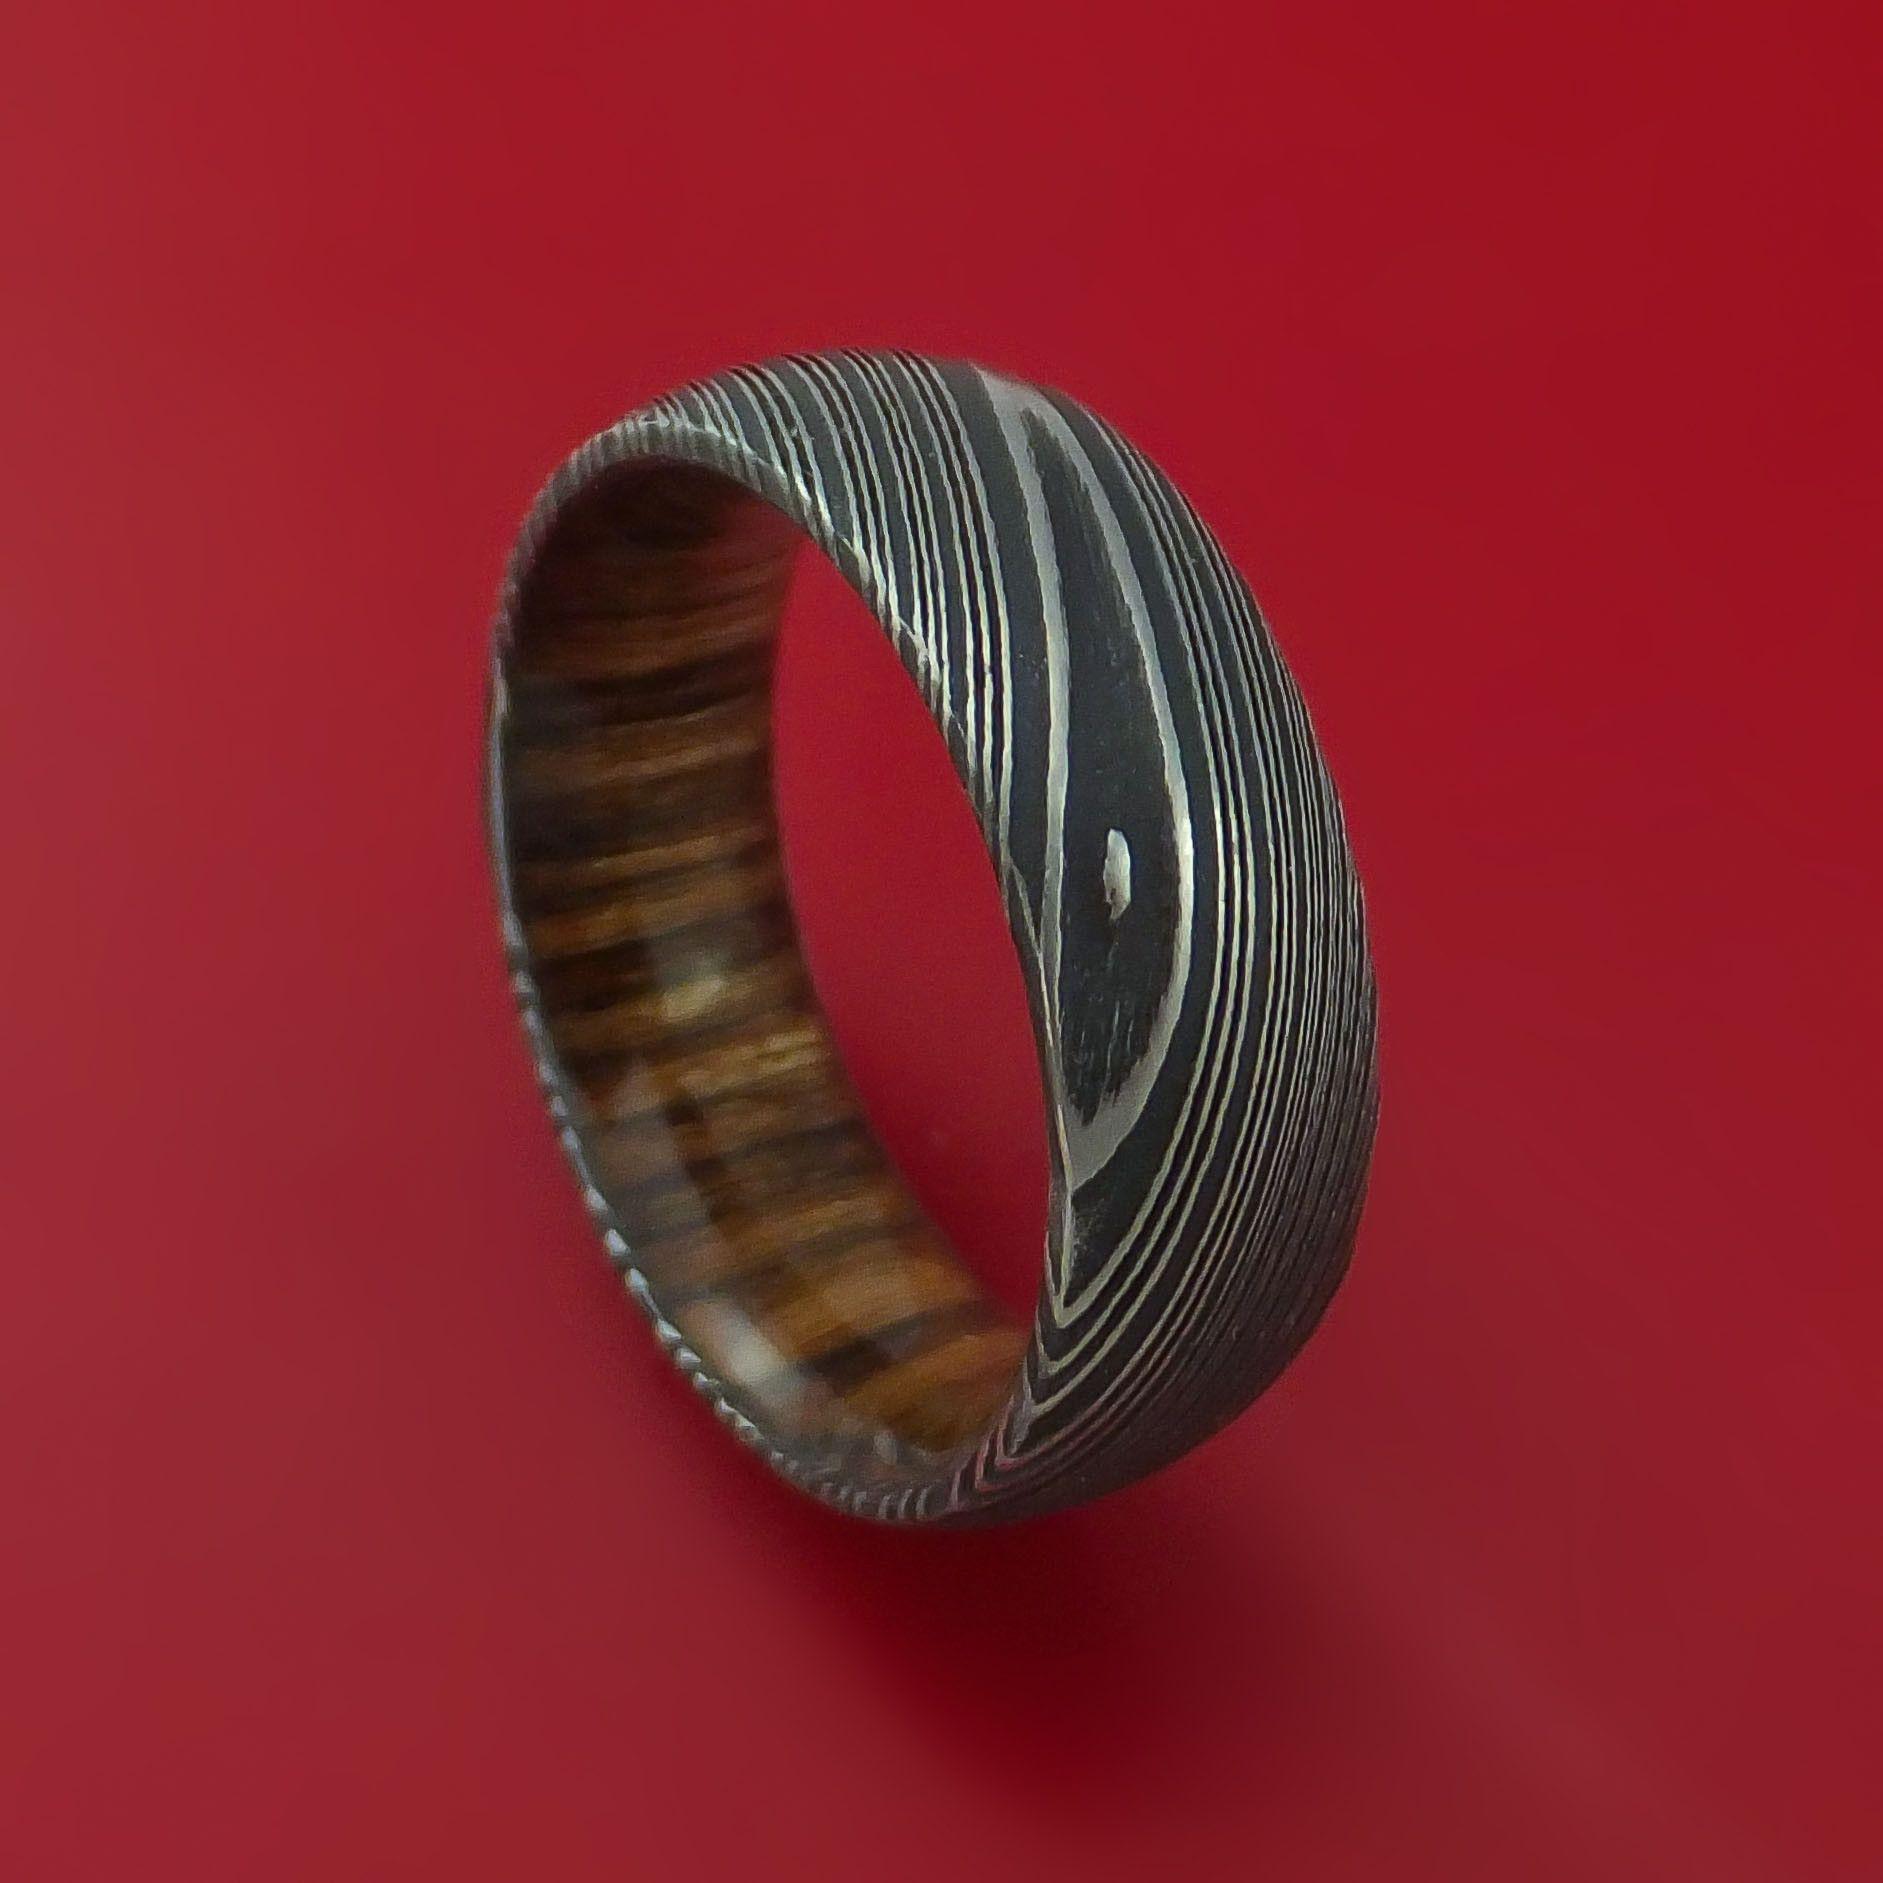 Kuro Damascus Steel Ring with Walnut Hardwood Sleeve Custom Made